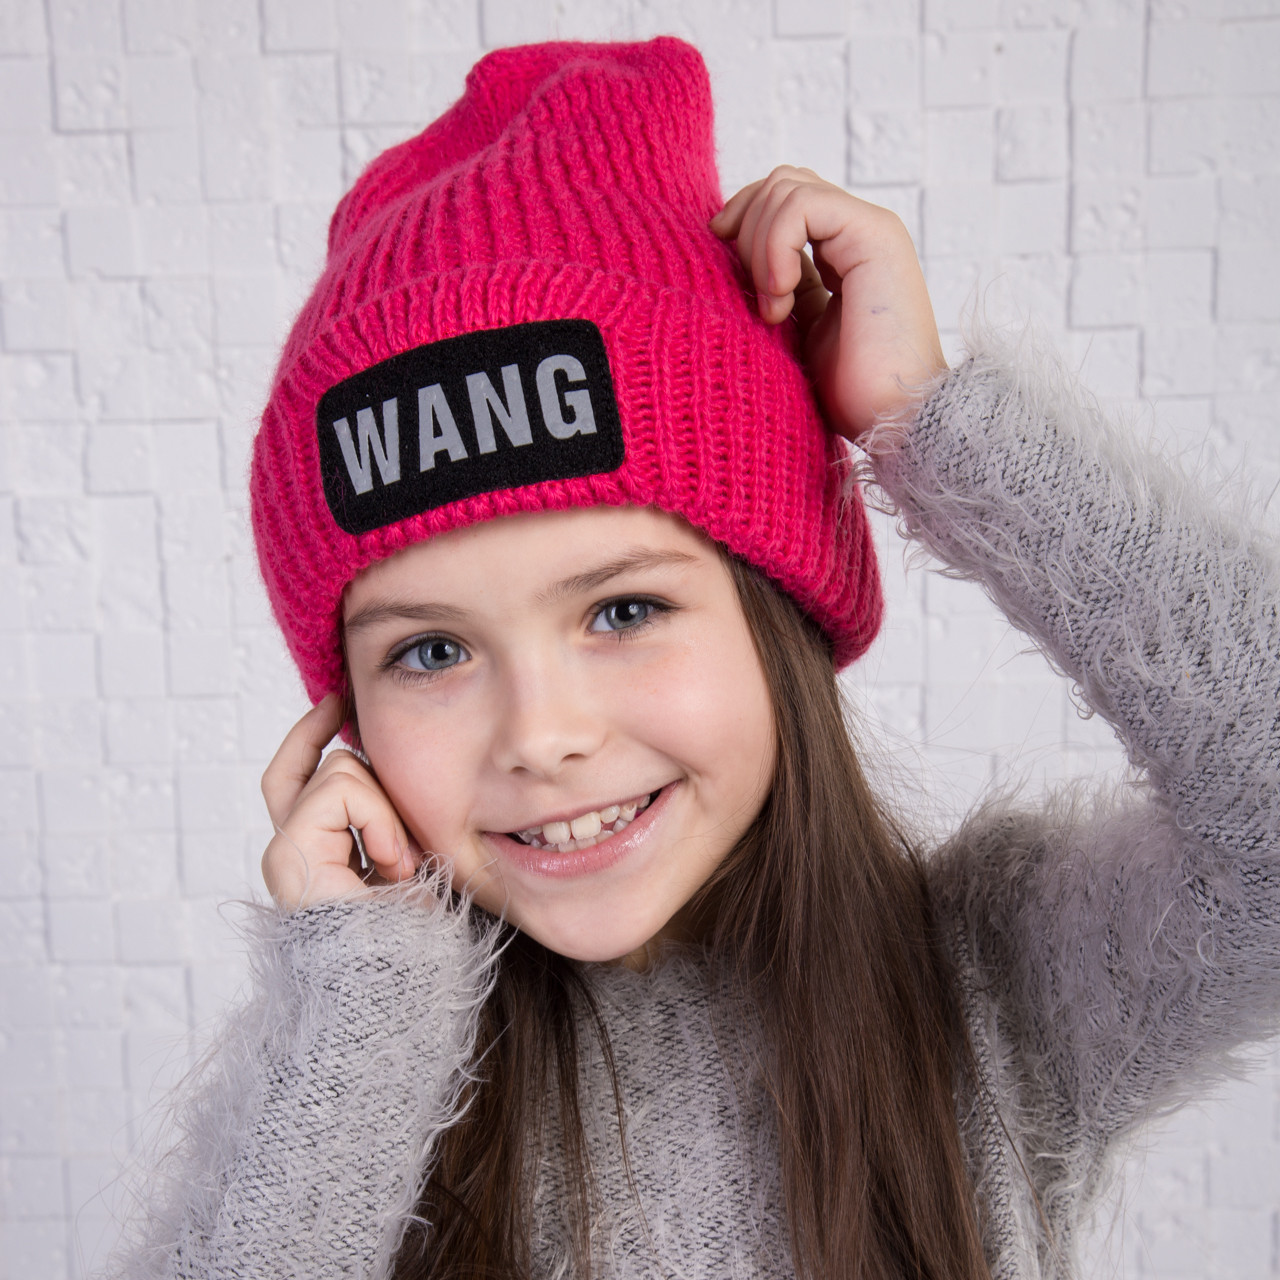 Вязаная шапка для девочки на флисе - WANG - Артикул 2160 (разные цвета)